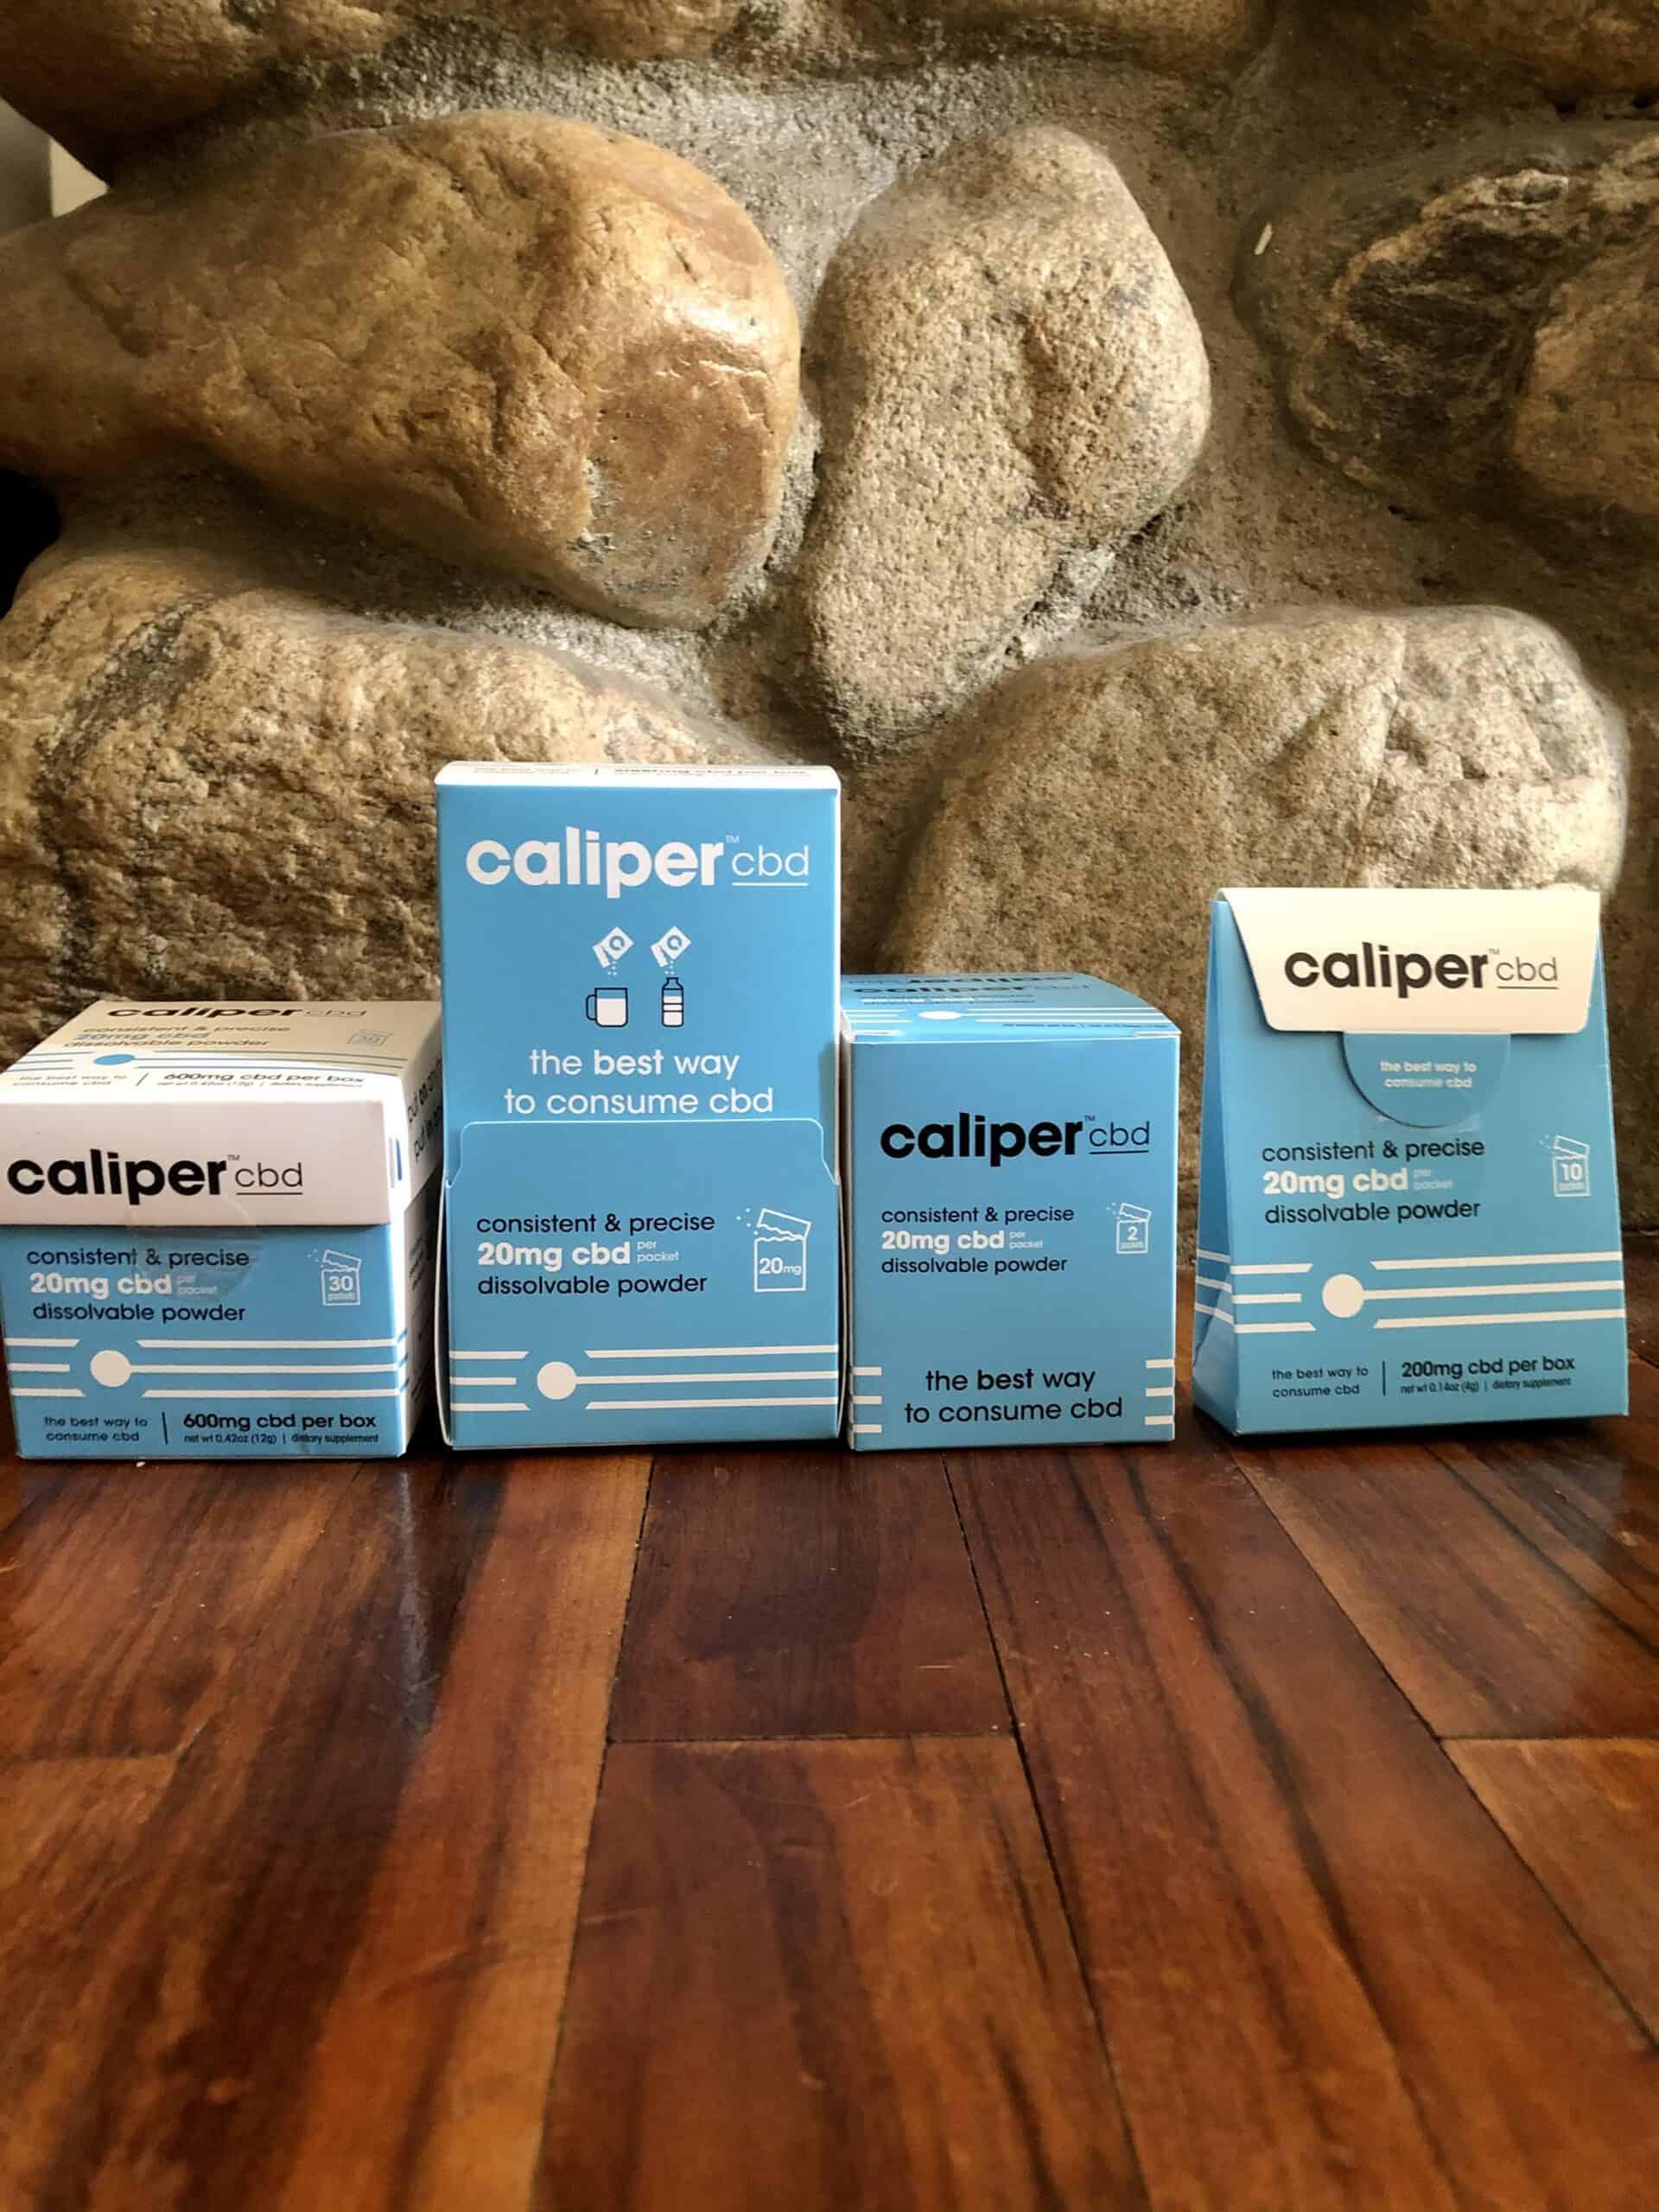 Caliper CBD Dissolvable Powder (20mg CBD per packet)